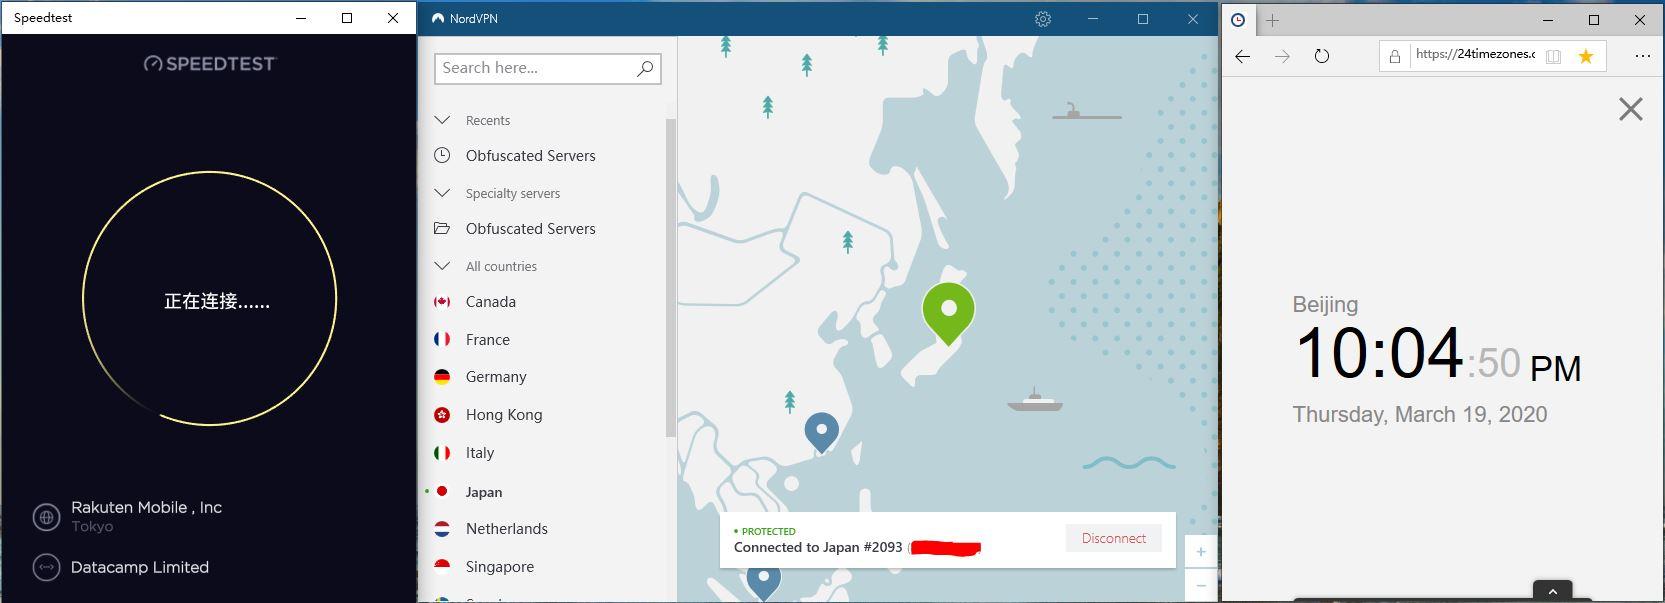 Windows10 NordVPN Japan #2093 中国VPN翻墙 科学上网 Youtube测速 - 20200319